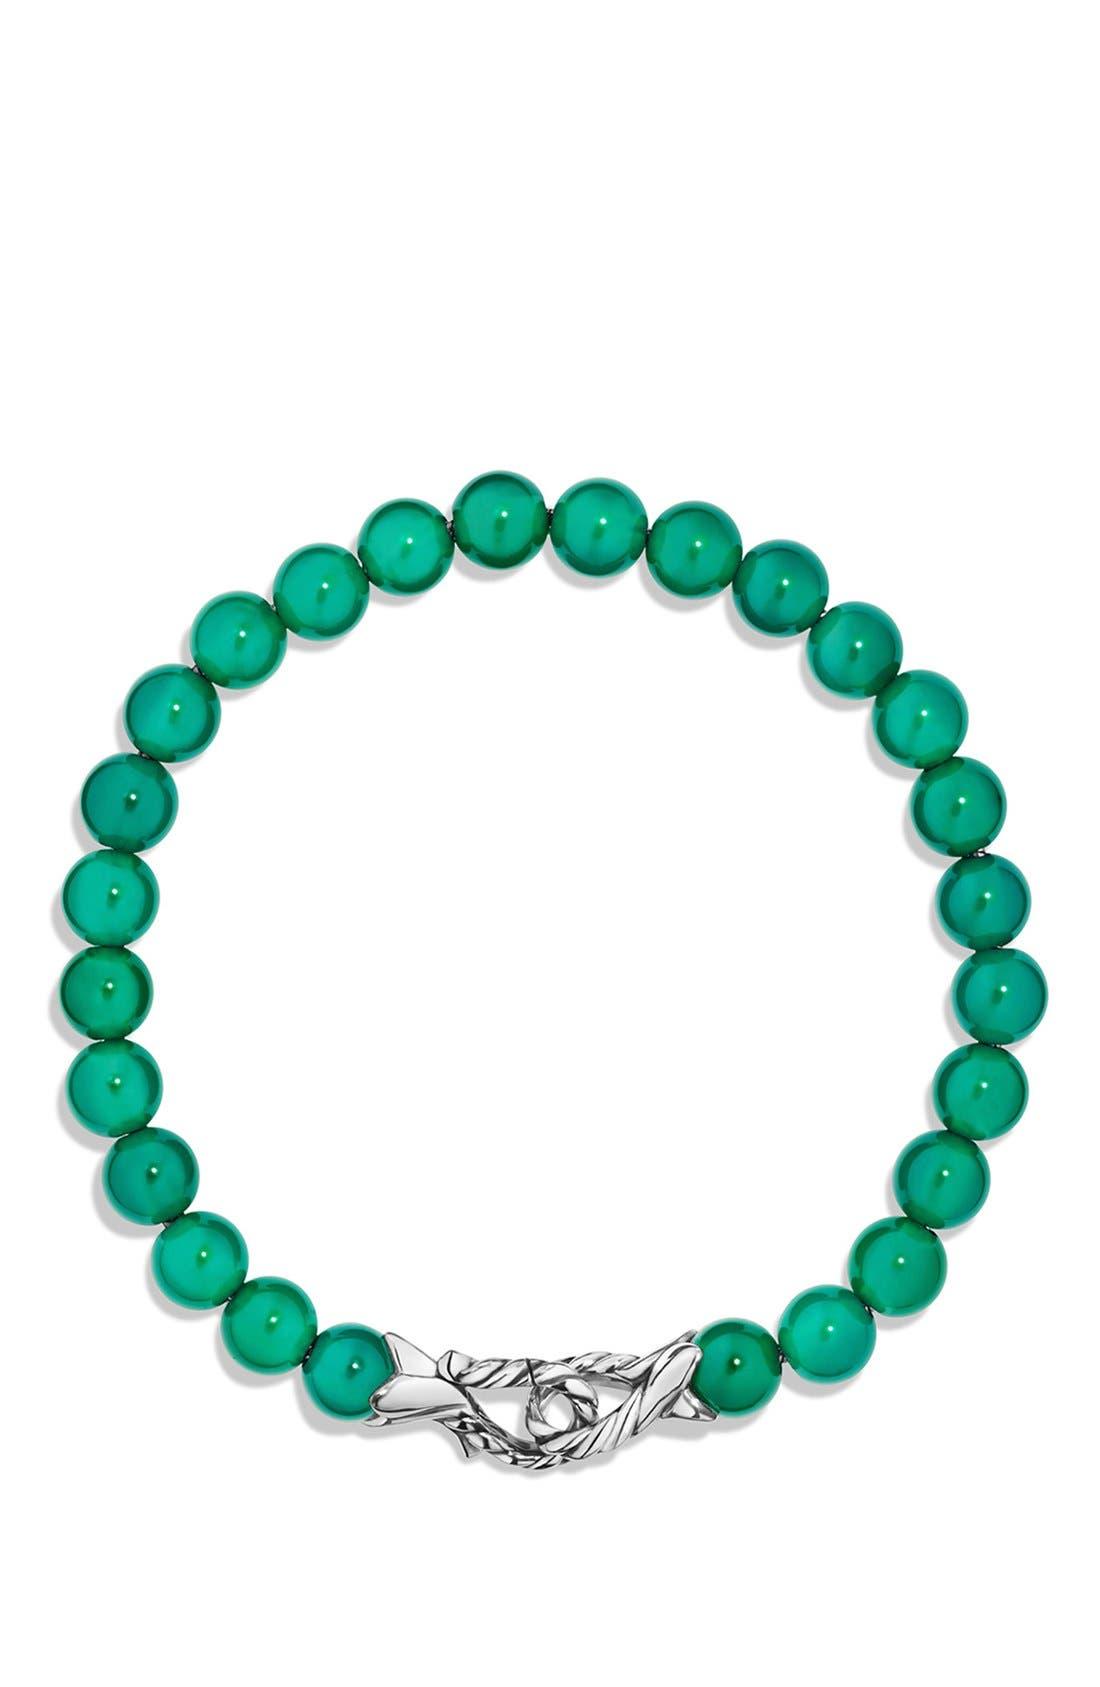 DAVID YURMAN,                             'Spiritual Beads' Bracelet,                             Alternate thumbnail 2, color,                             GREEN ONYX